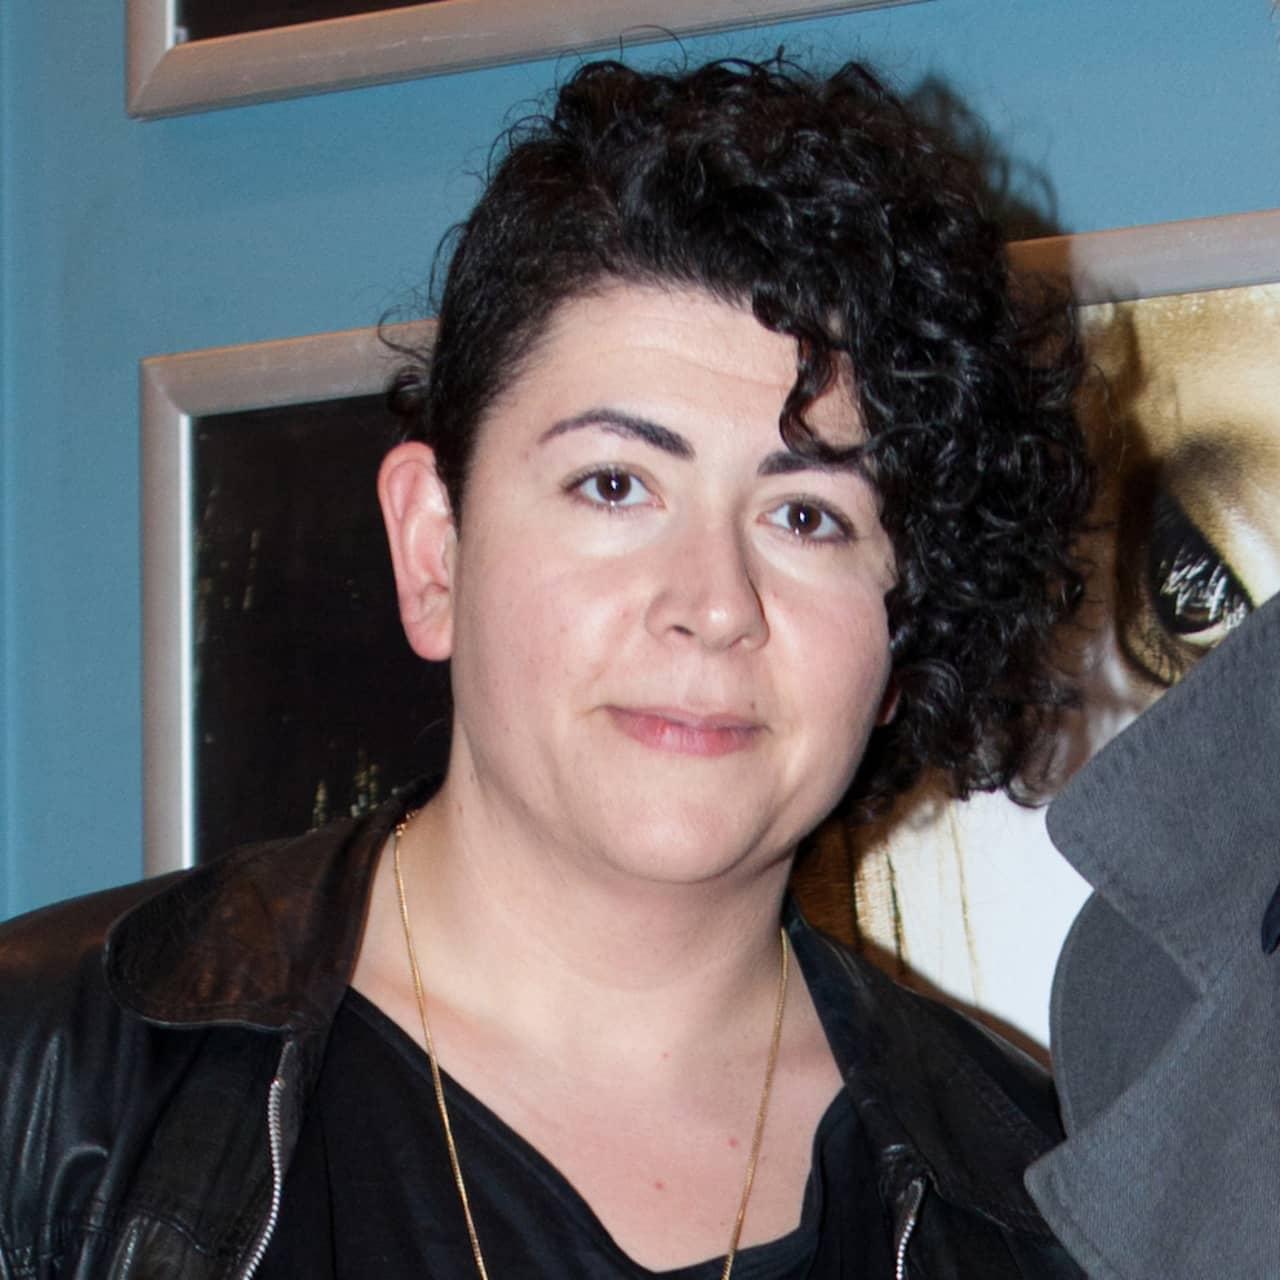 97. Farnaz Arbabi